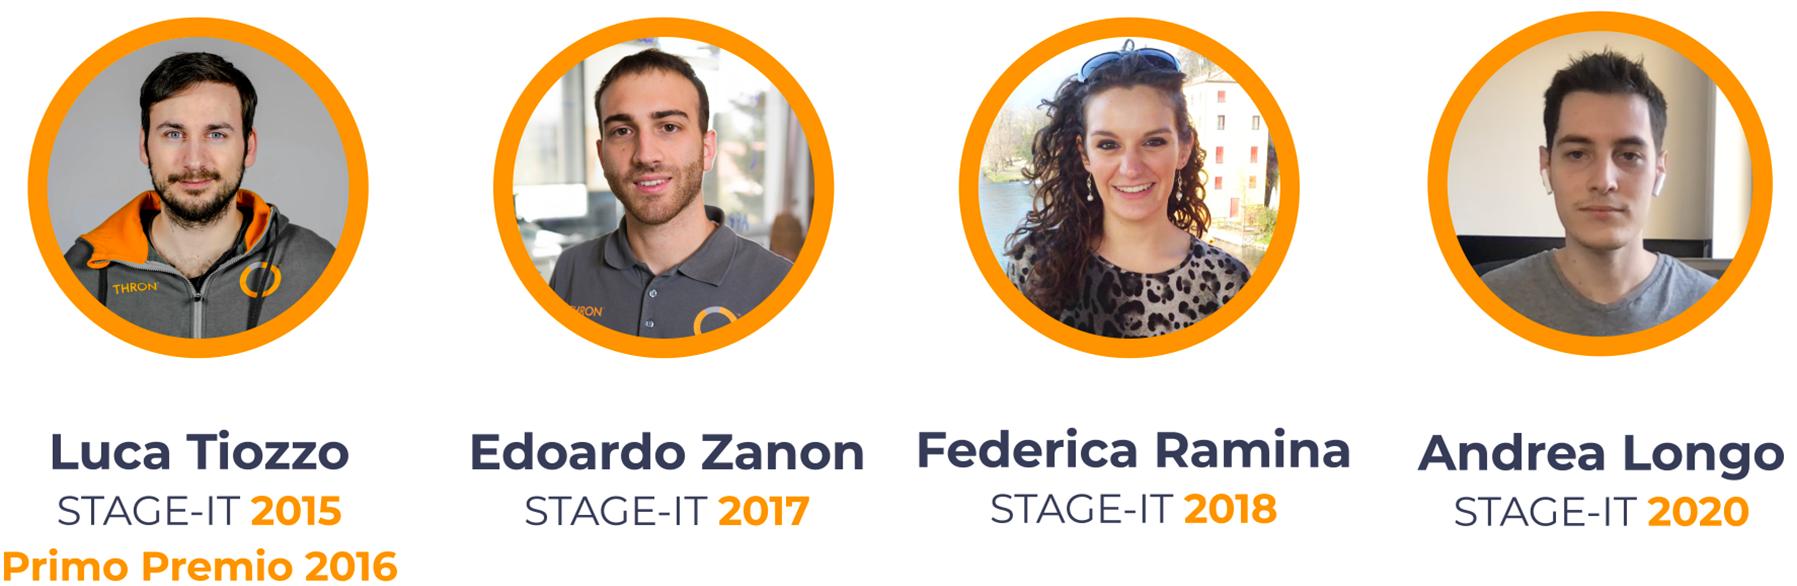 stage-it 2021